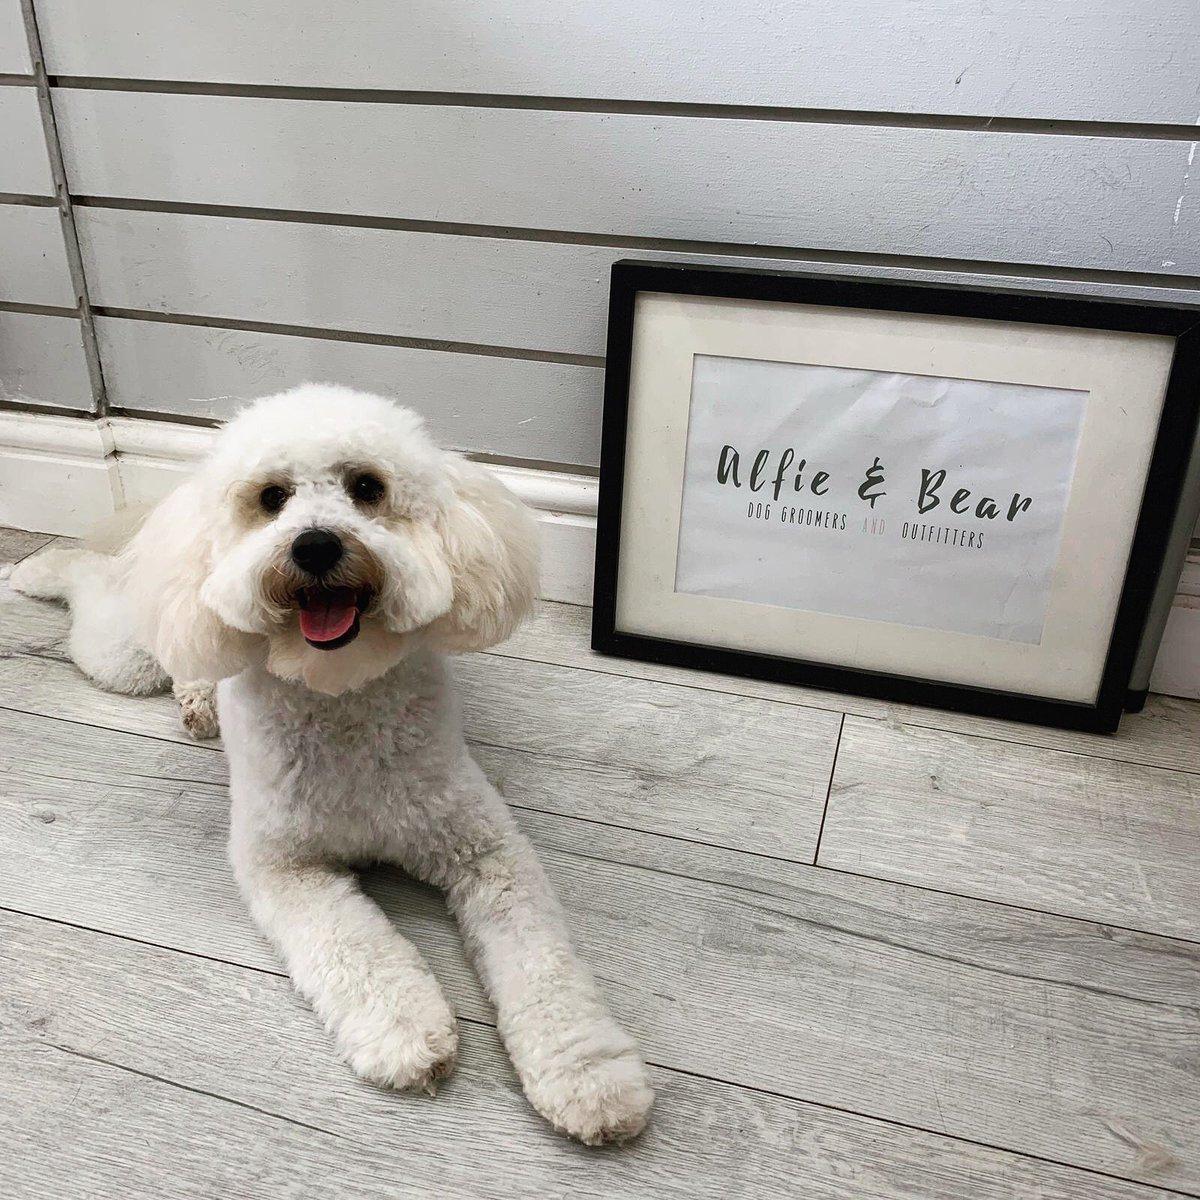 Full Groom | Daisy - Cavapoo  Such A Happy Girl    #DogGroomer #DogGrooming #Cavapoo #Dogs #DogSpa #DogGroomingSalon #DogOfTheDay #DogsOfTwitter #DogLovers #NEFollowers #NewcastleUponTyne<br>http://pic.twitter.com/rYpCbSmMQm